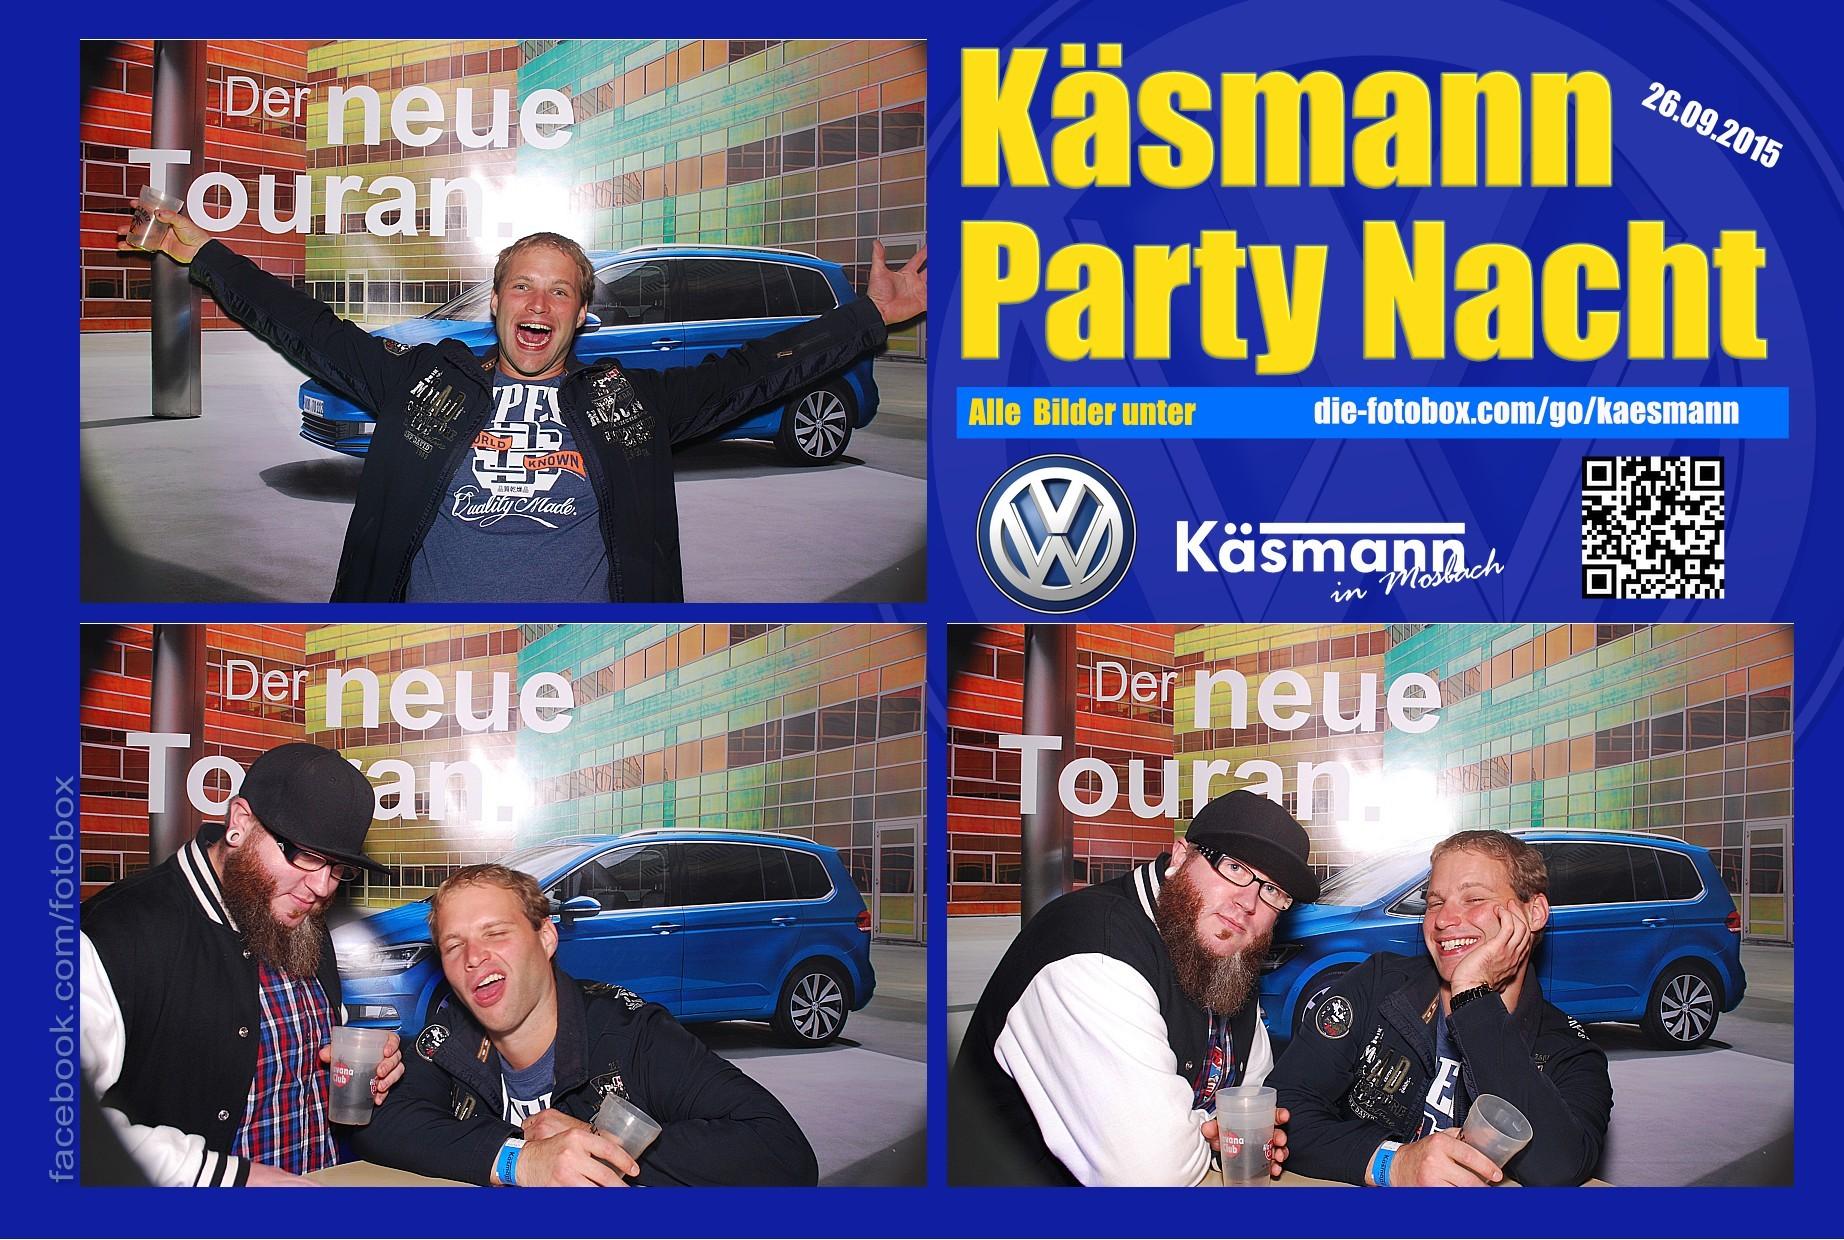 Käsmannparty 2015 - www.die-fotobox.com 01216